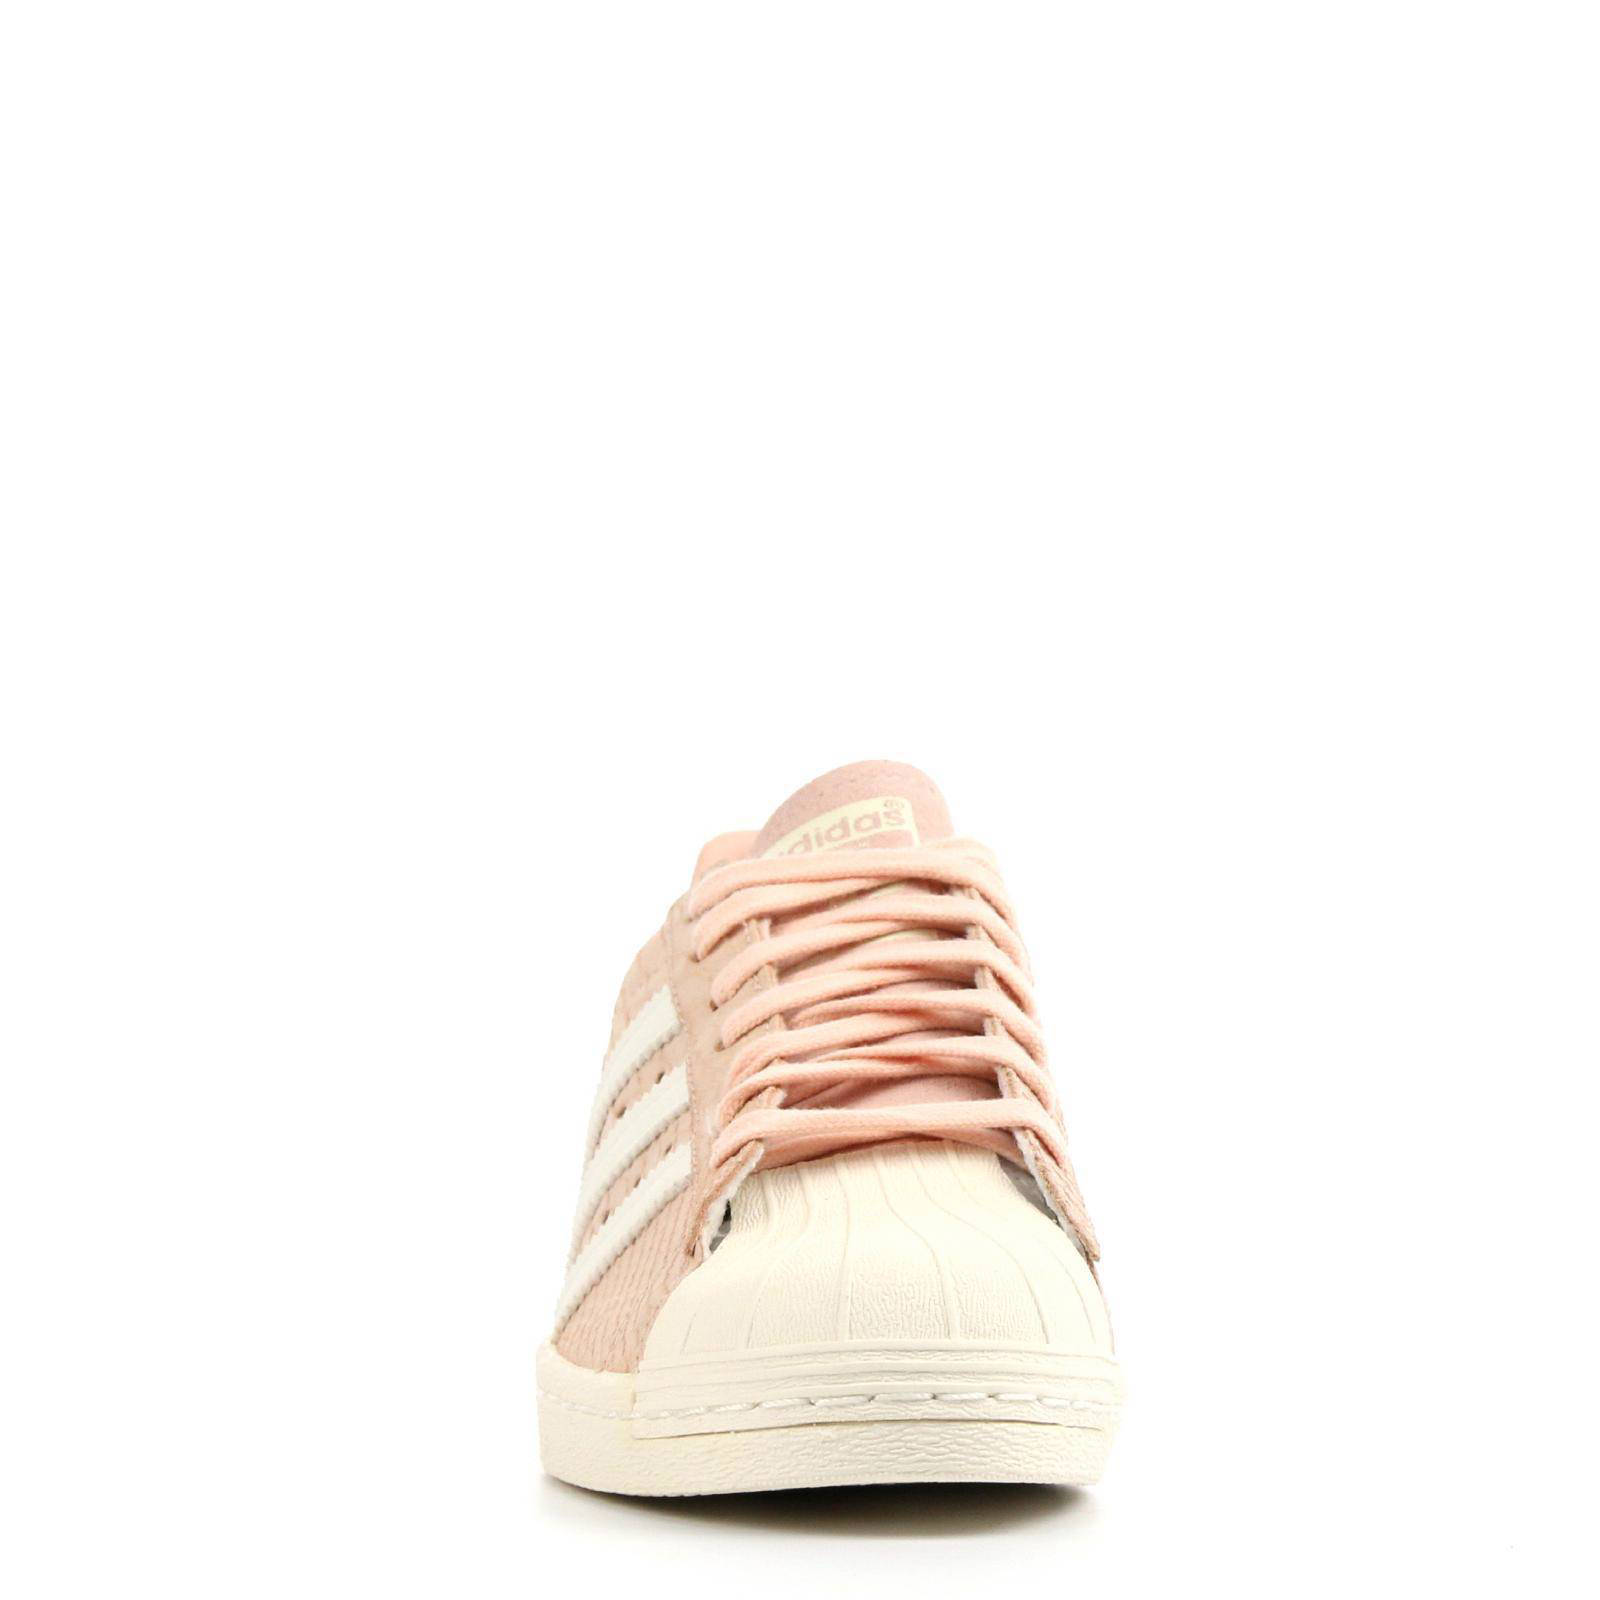 adidas originals Superstar Python suède sneakers | wehkamp